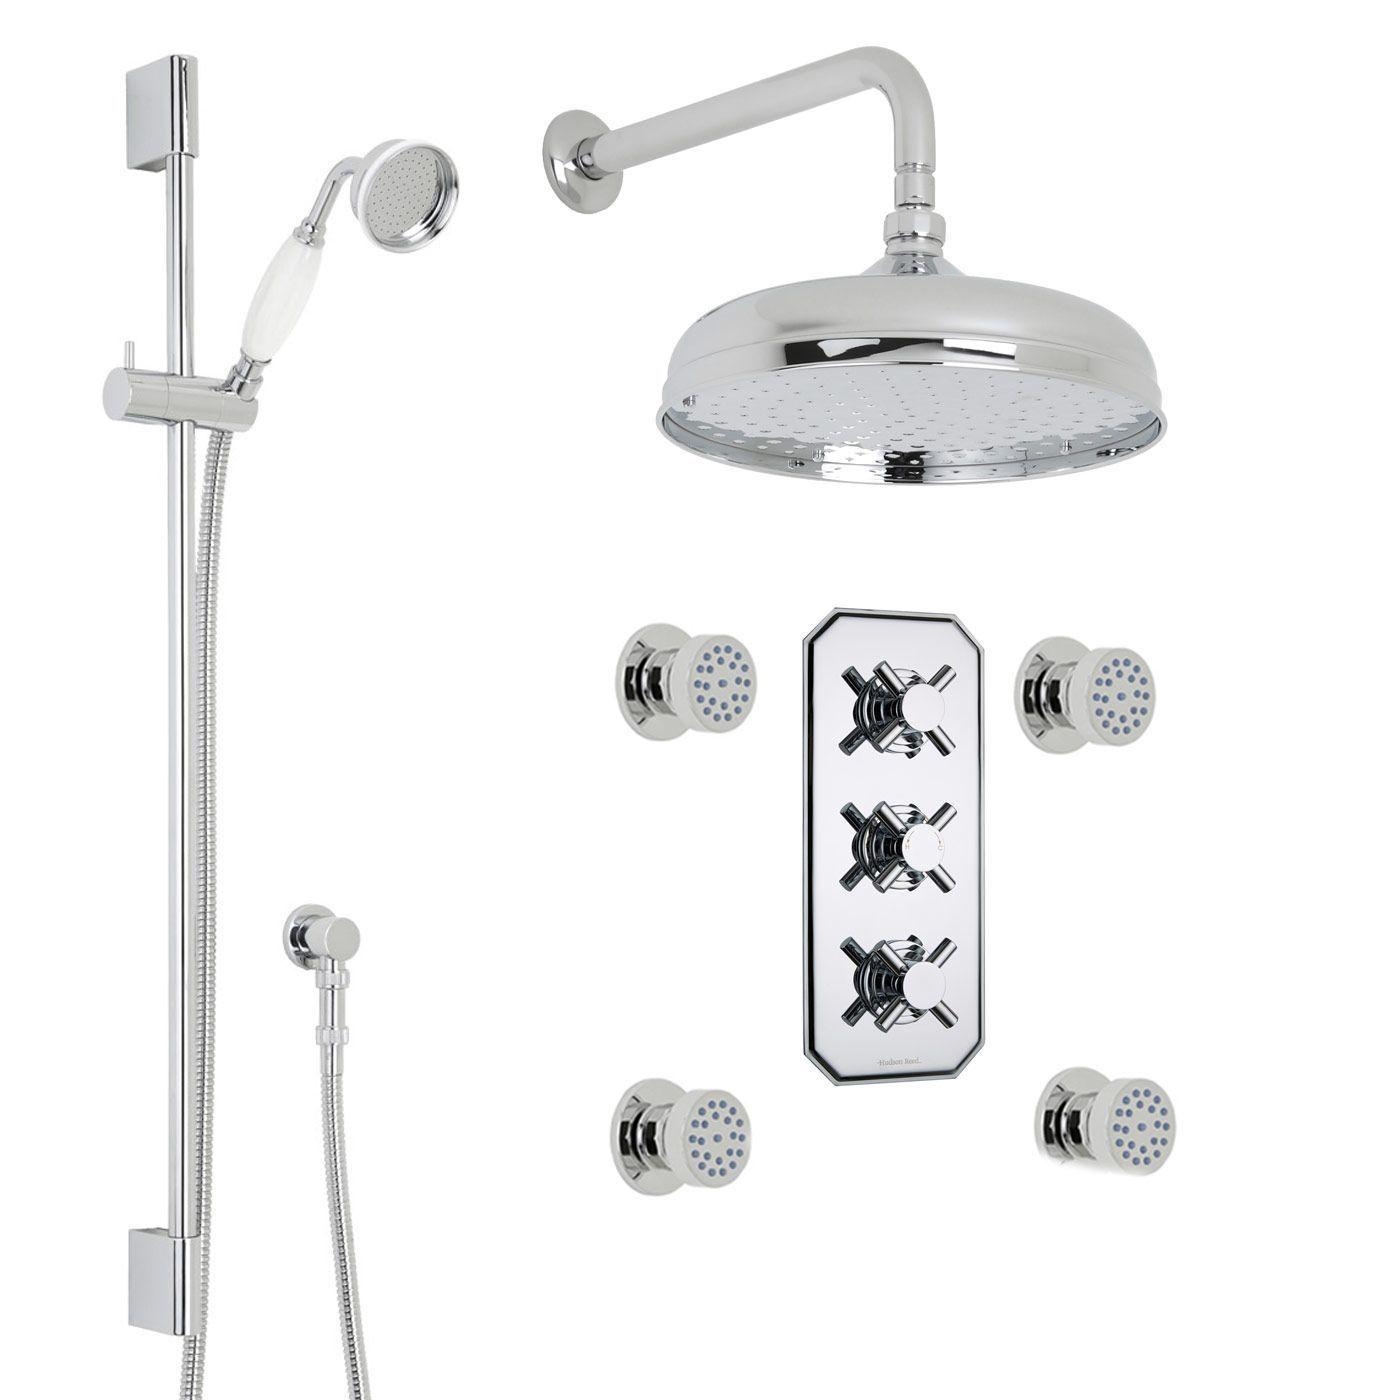 "Kristal Thermostatic Shower System with 12"" Round Head & Wall Arm , Handset & 4 Round Body Sprays"